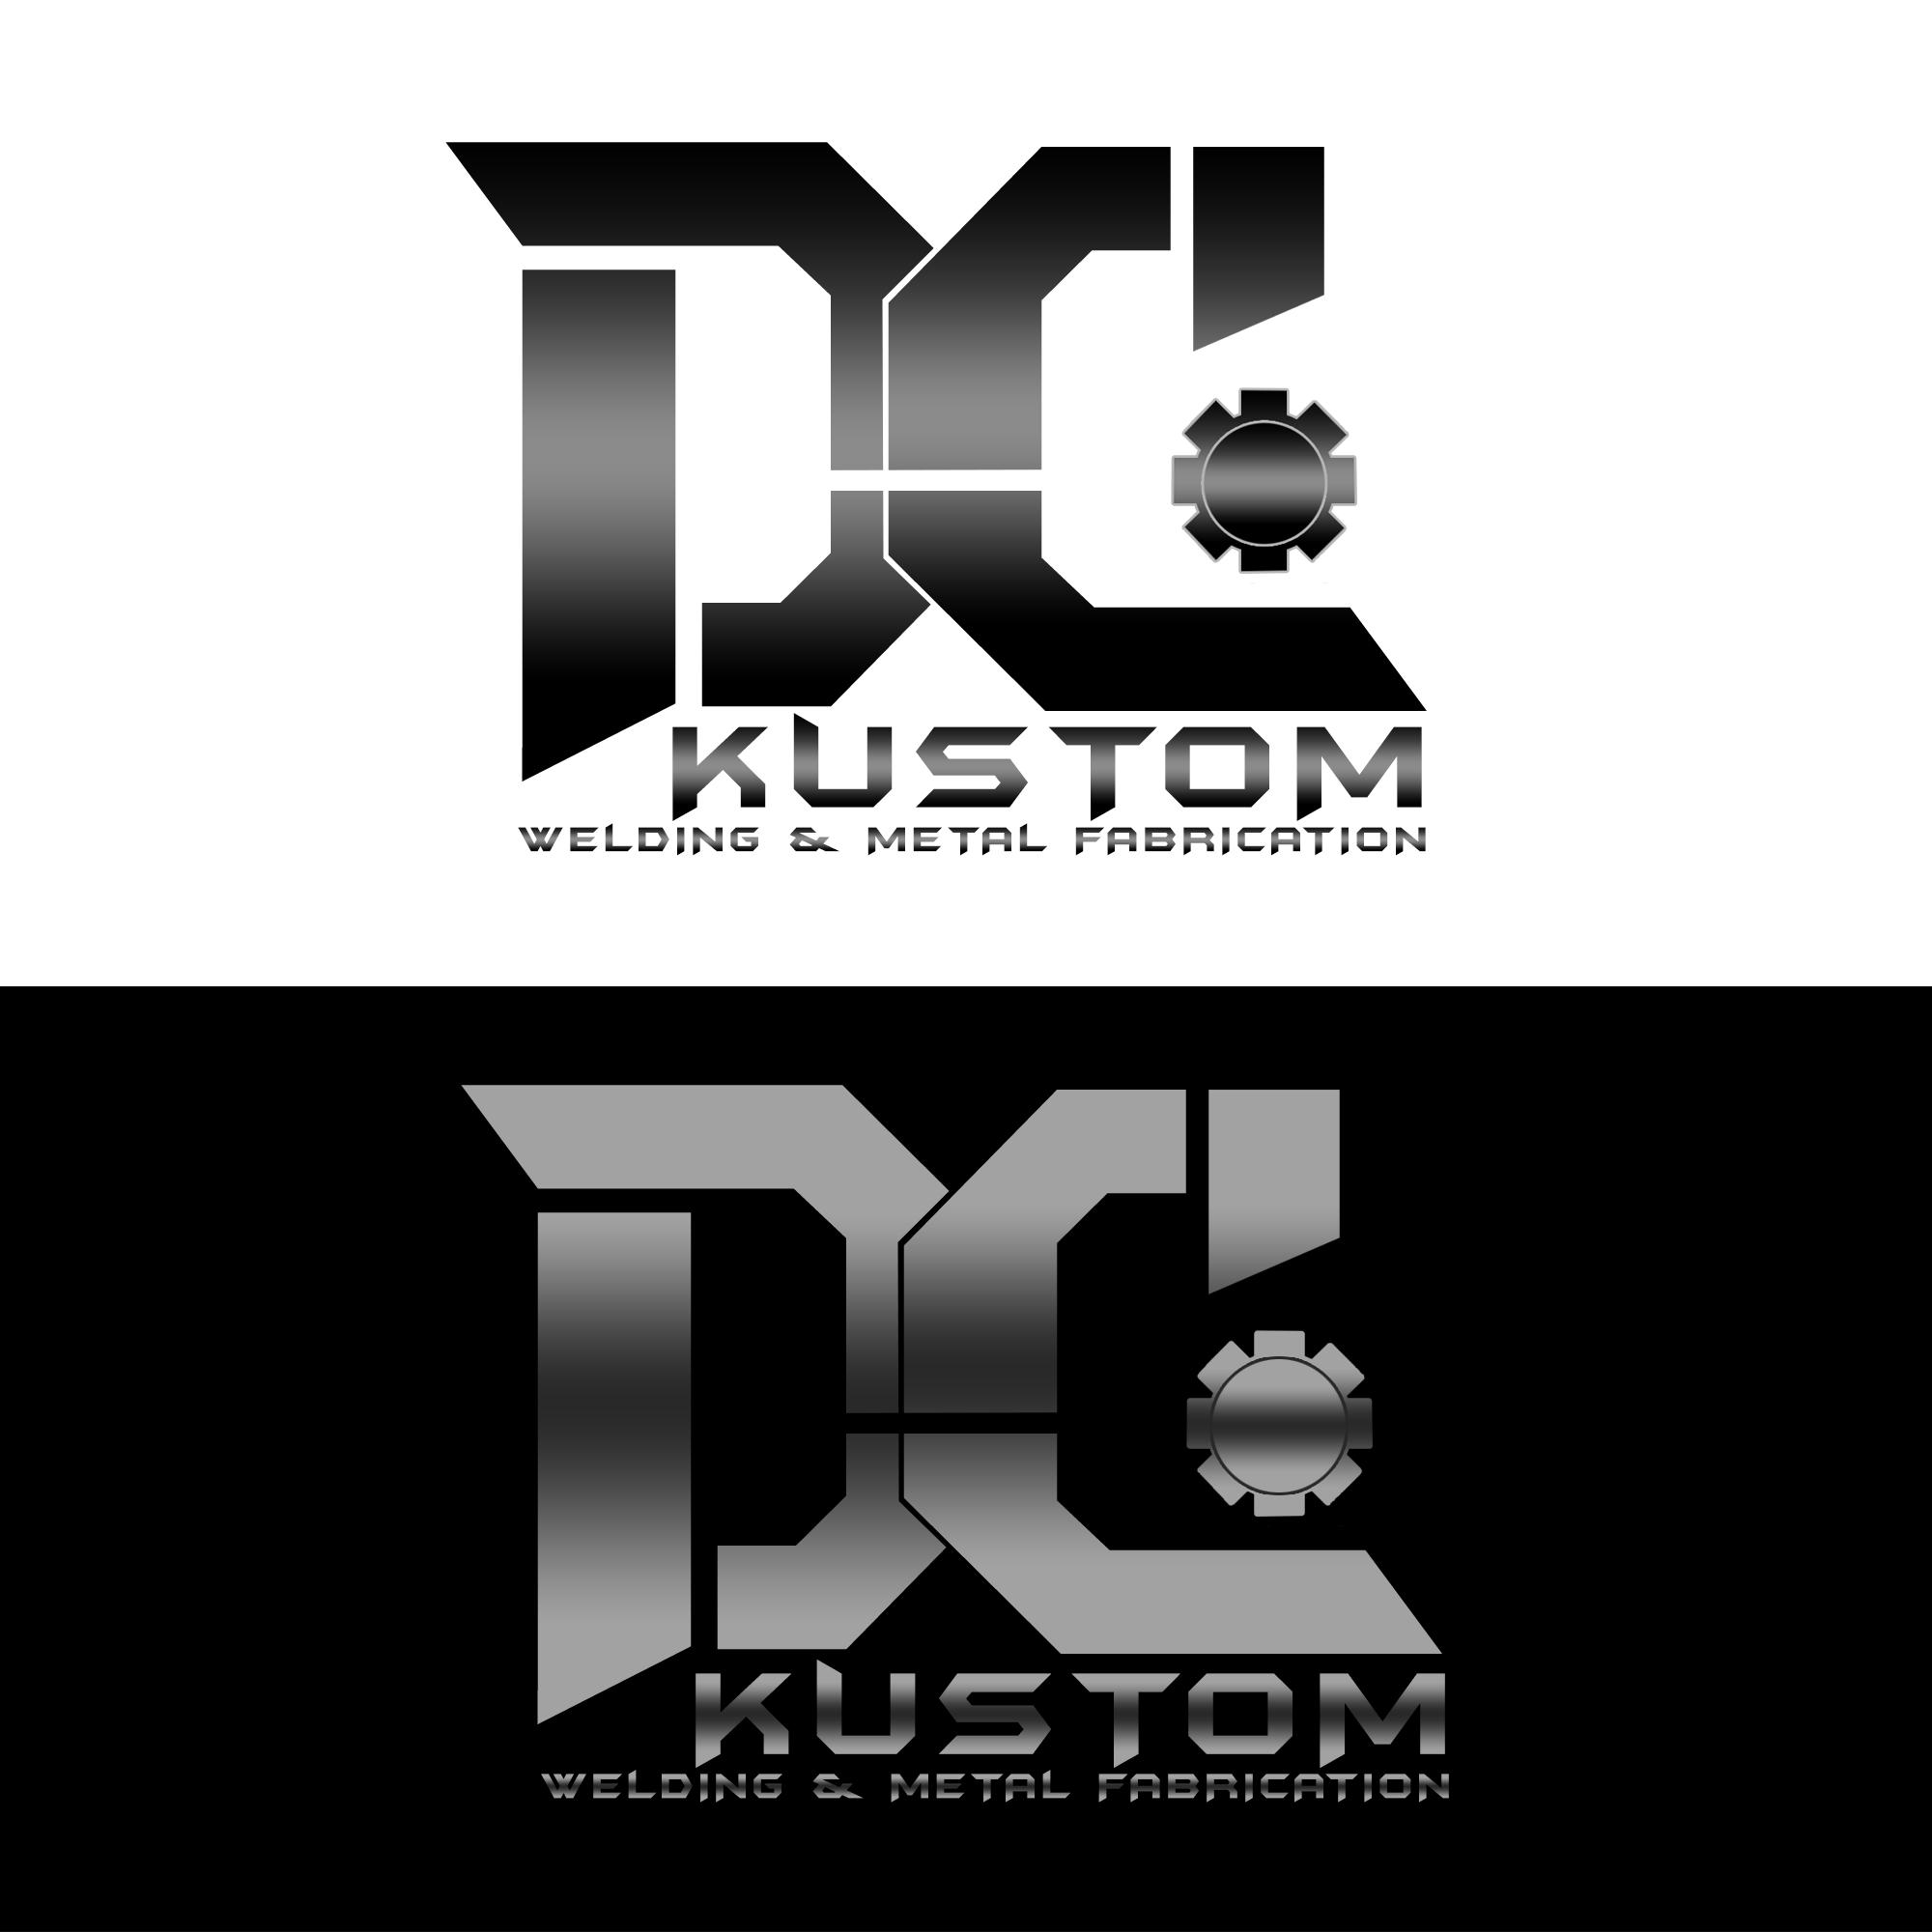 Logo Design by Julboy Salupan - Entry No. 182 in the Logo Design Contest Imaginative Logo Design for DC KUSTOM WELDING & METAL FABRICATION.